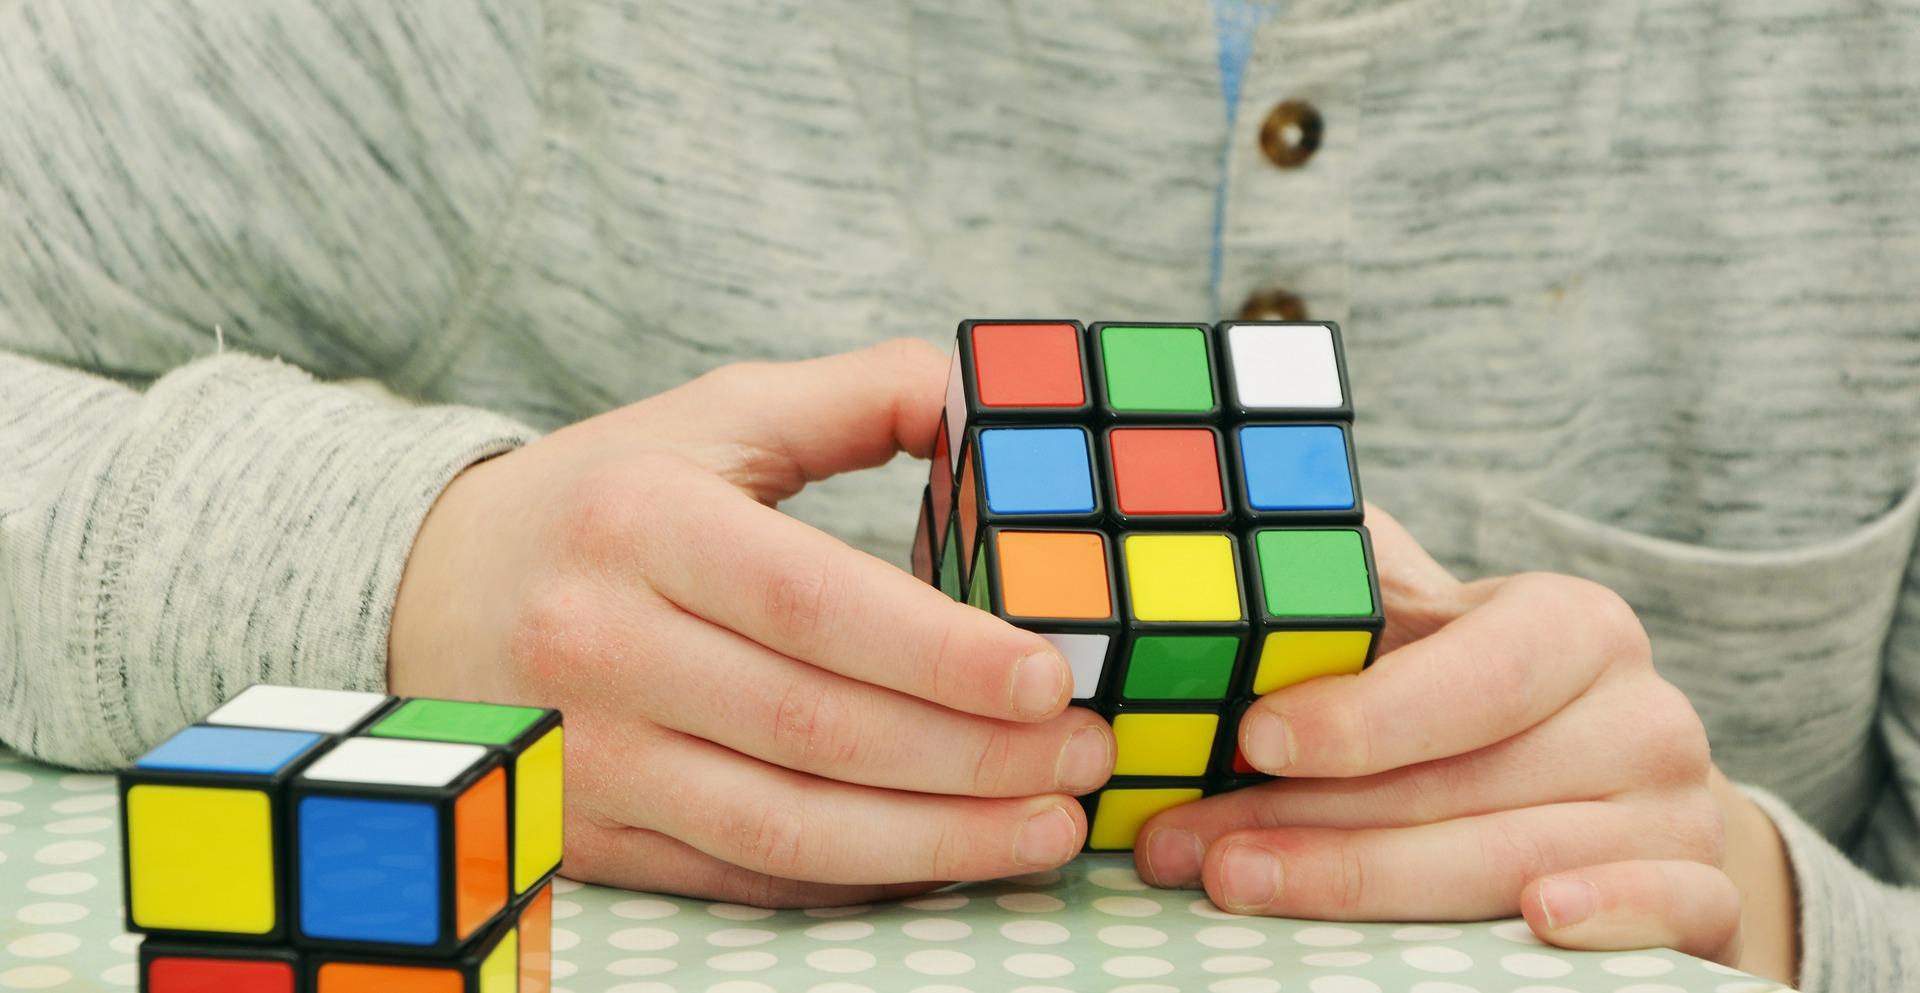 Solving the rubik's cube of social impact